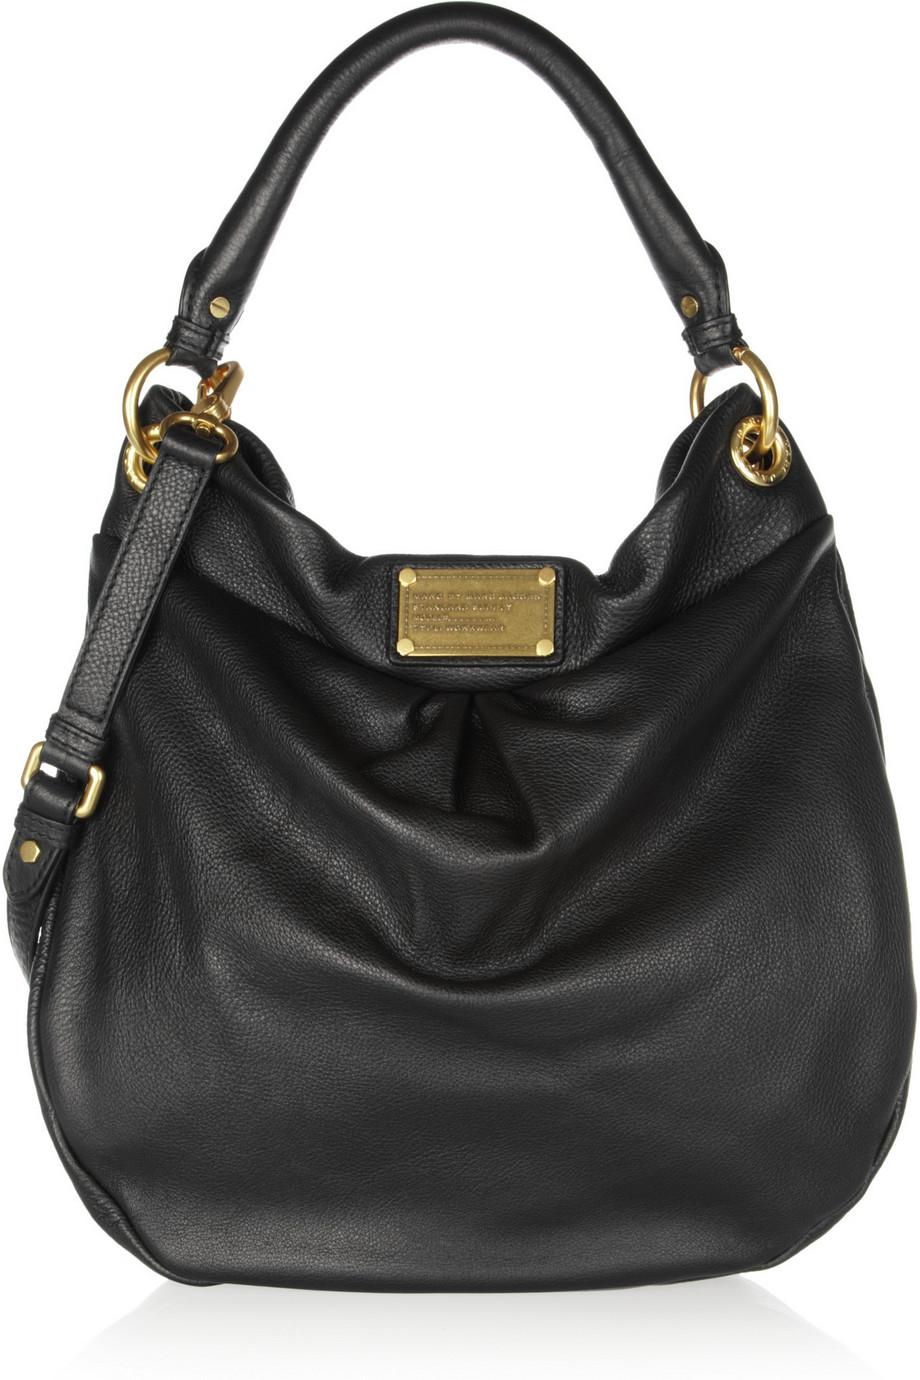 Marc Jacobs Shoulder Bags Canada 90